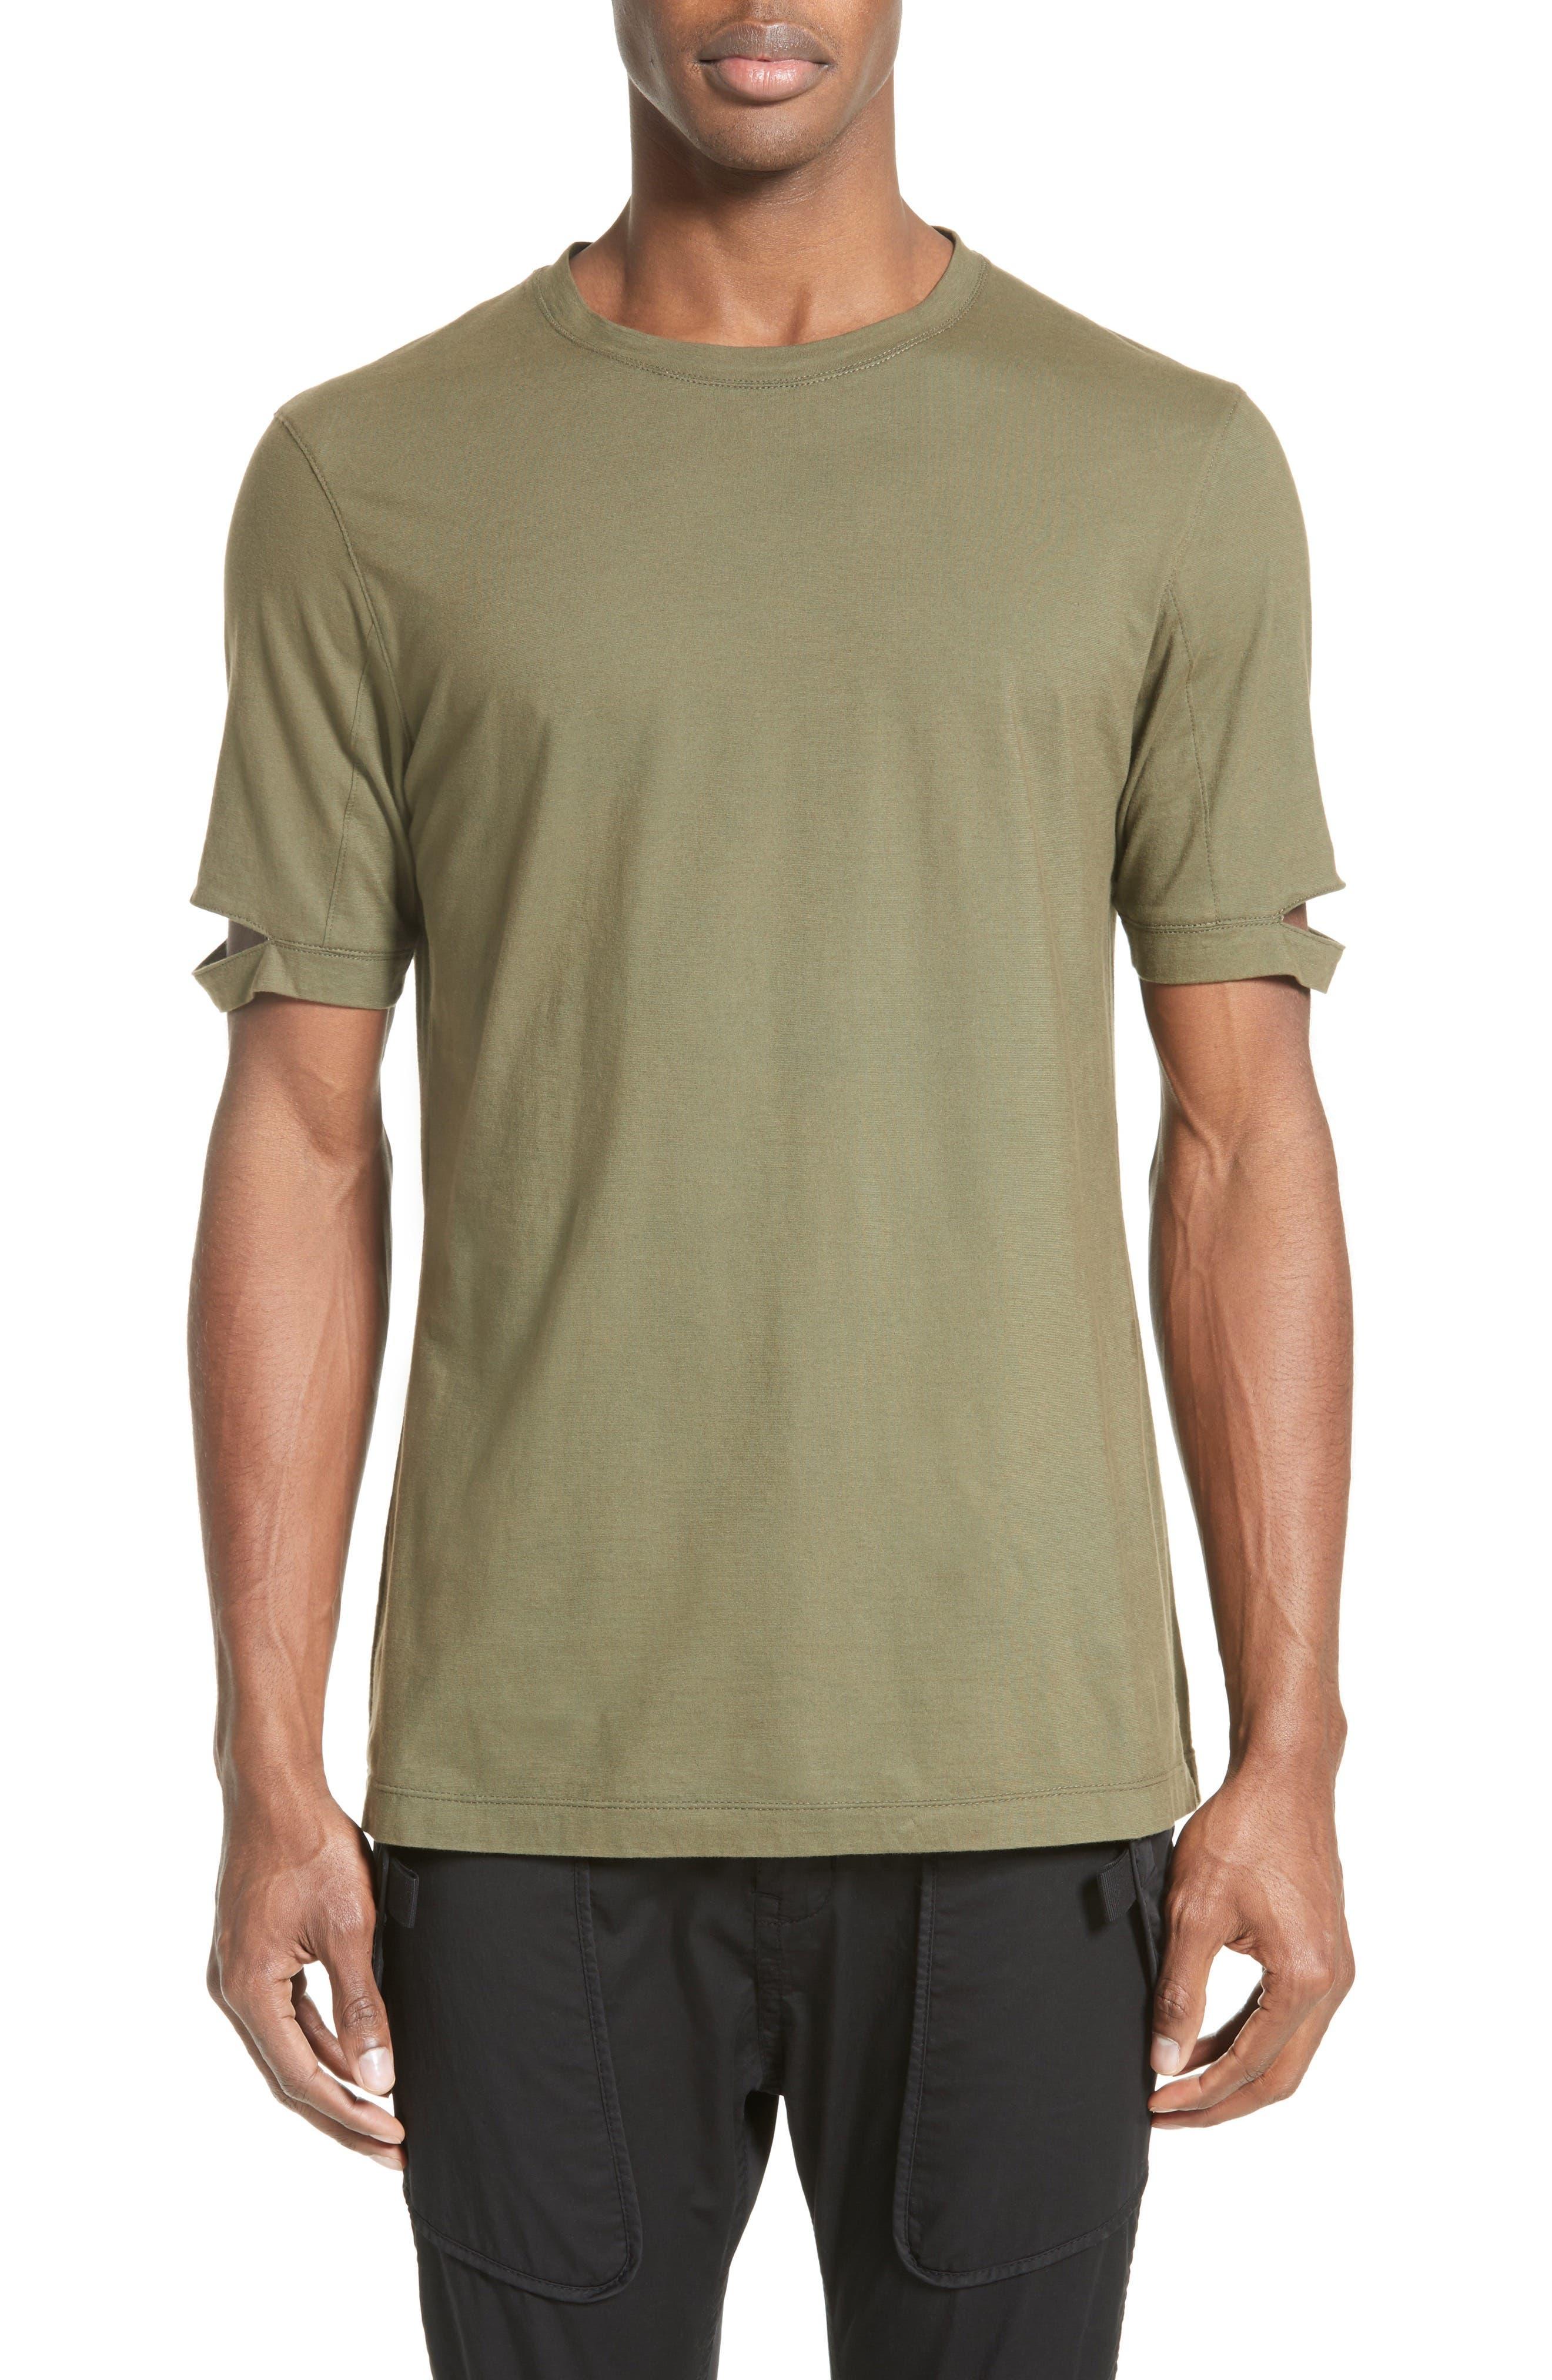 Helmut Lang Sliced Sleeve T-Shirt